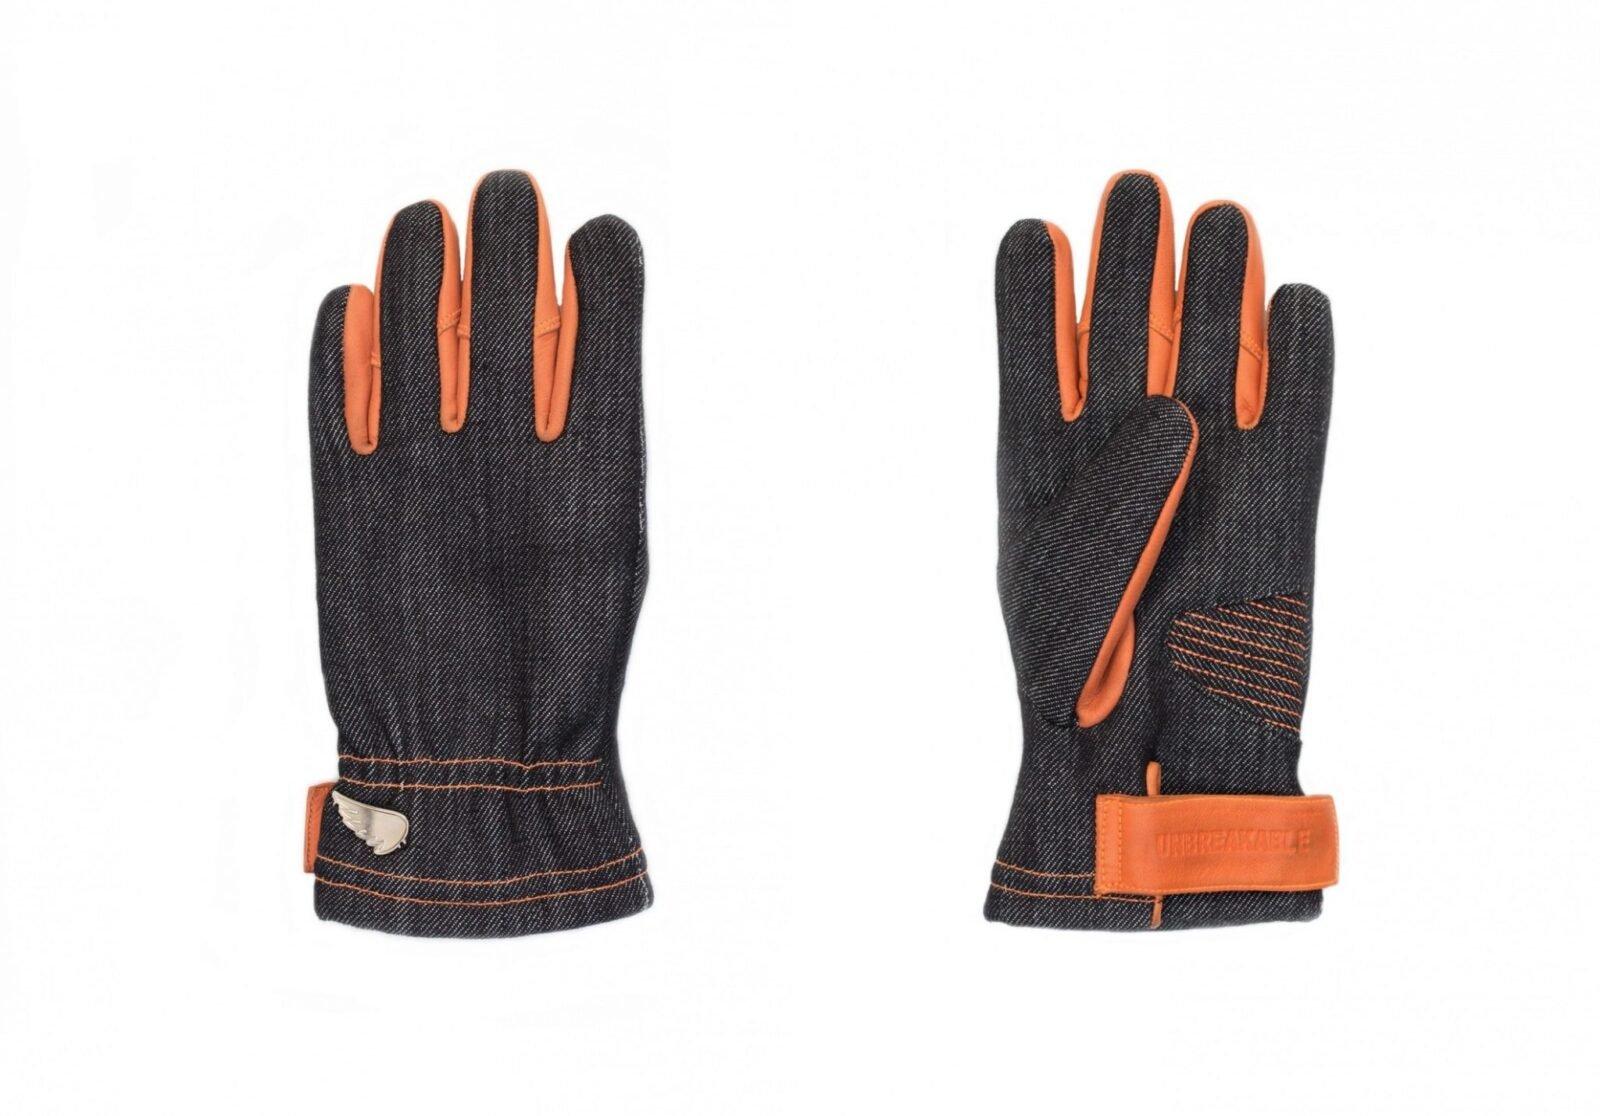 Saint Unbreakable Motorcycle Gloves 1600x1116 - Saint Unbreakable Motorcycle Gloves